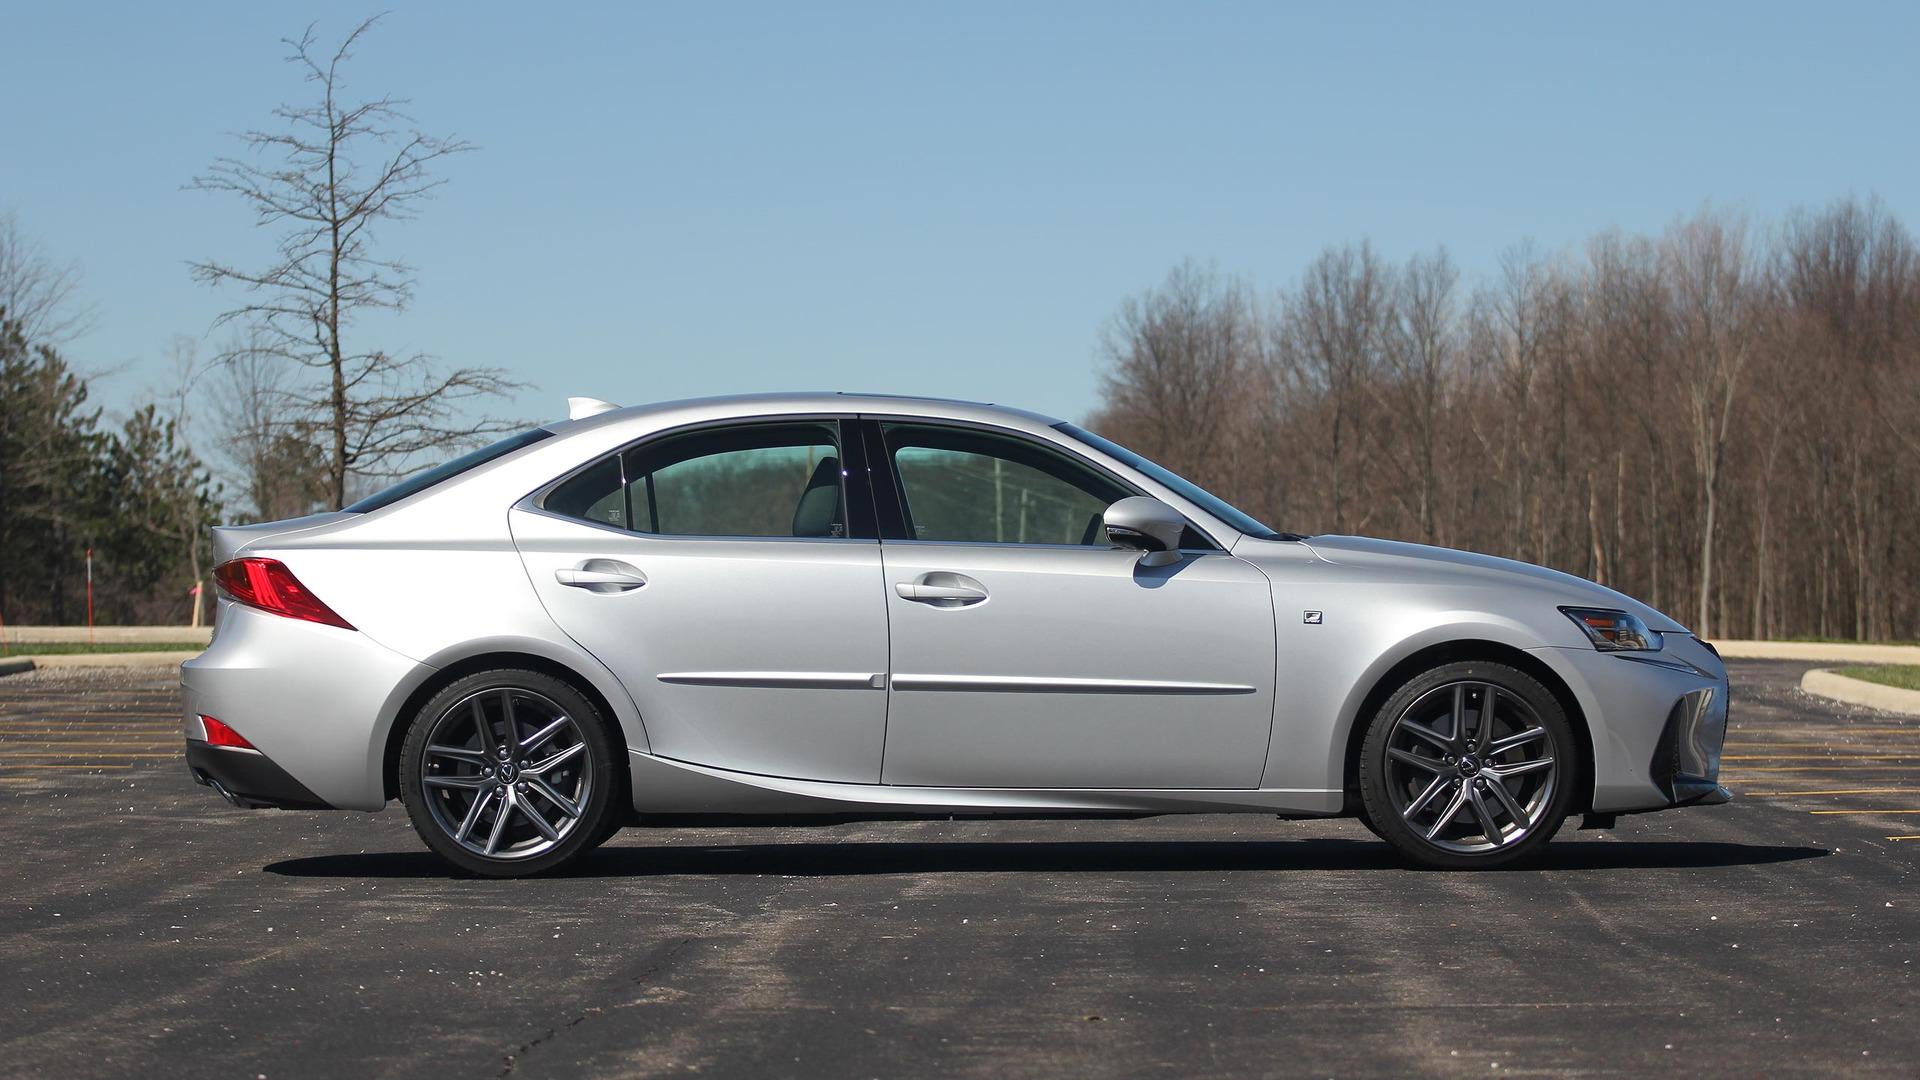 2020 Lexus Is Could Get 400 Horsepower Biturbo V6